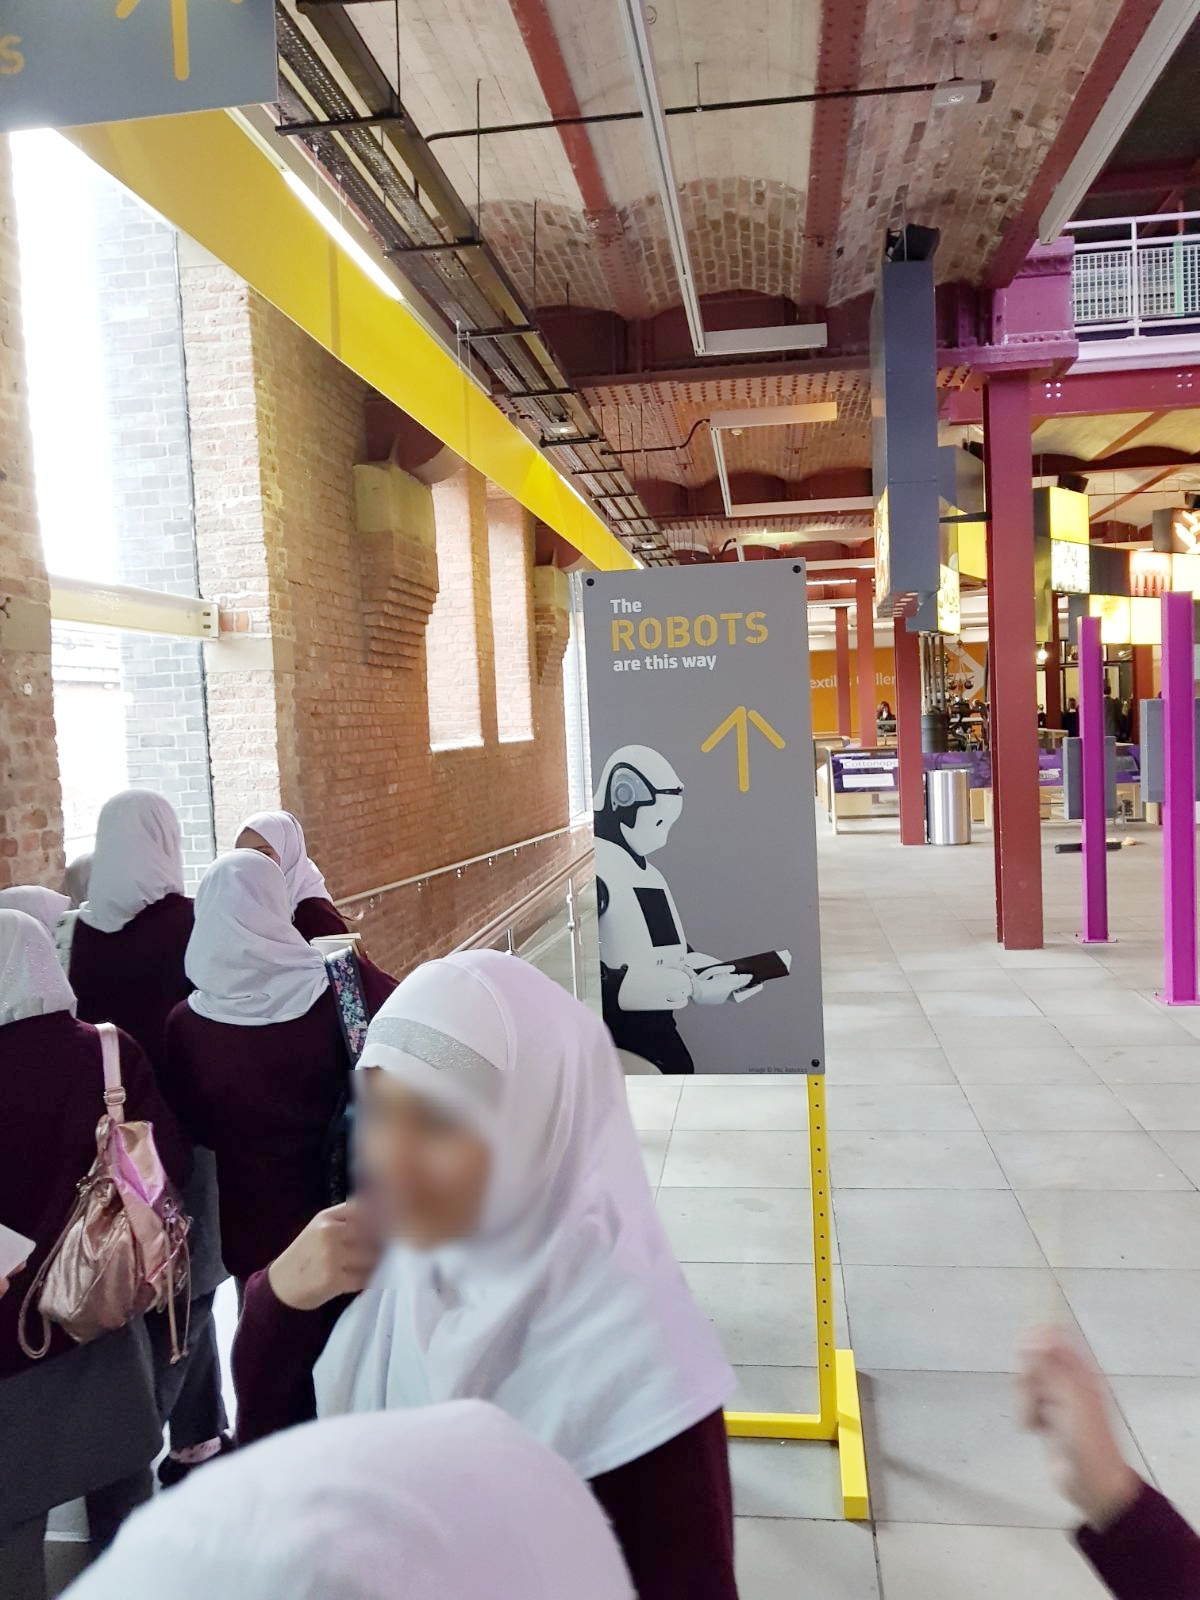 Robot Exhibition in Manchester